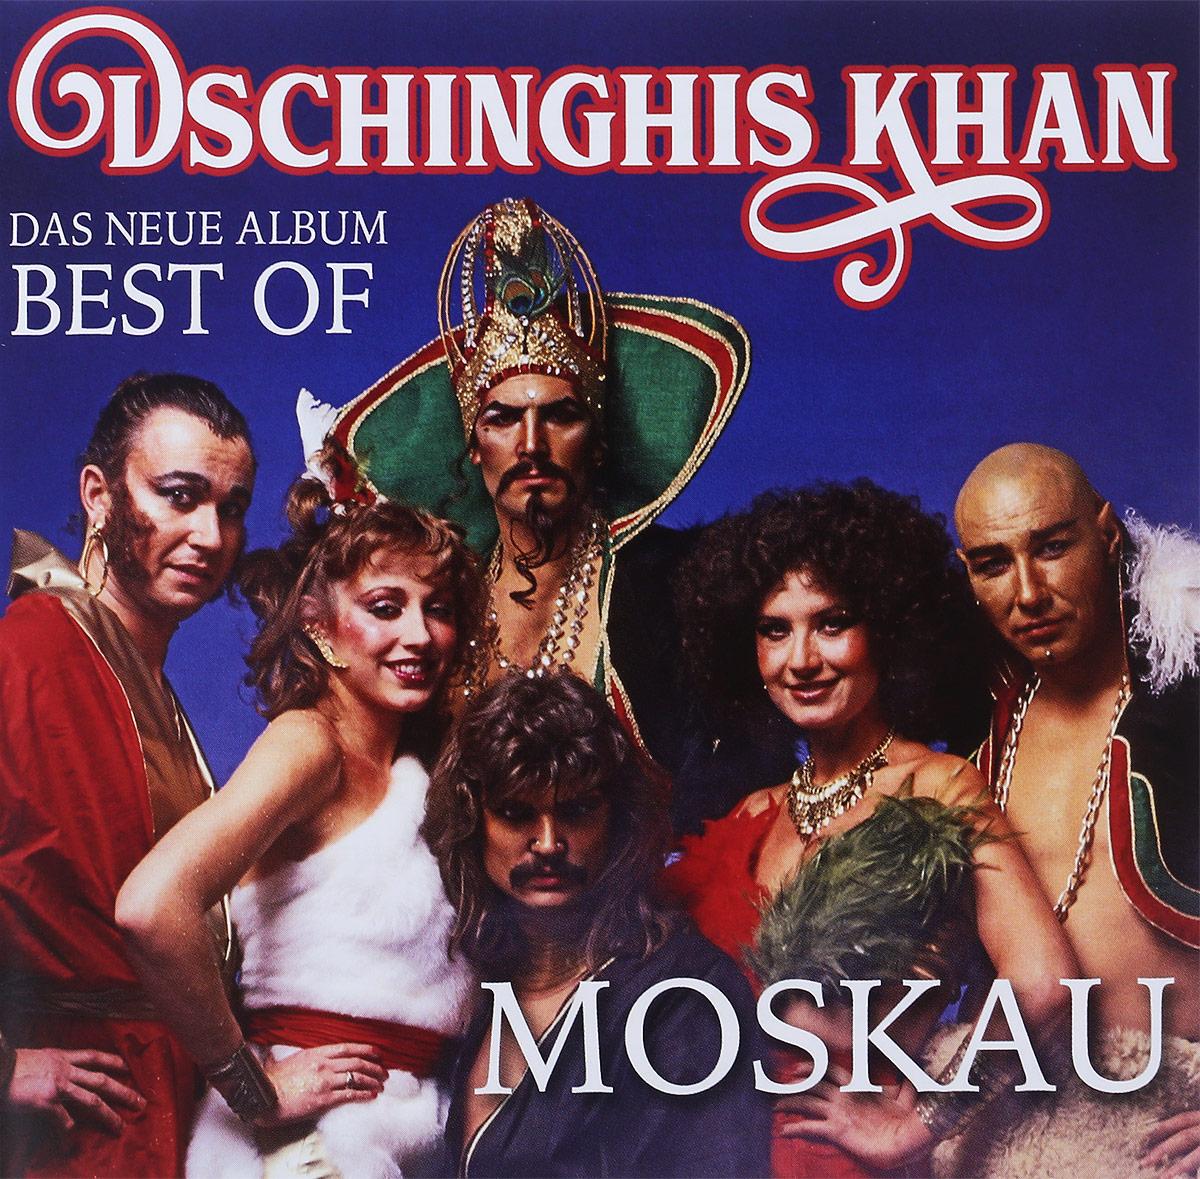 Dschinghis Khan Dschinghis Khan. Moskau. Best Of sadiqullah khan orchard of raining petals